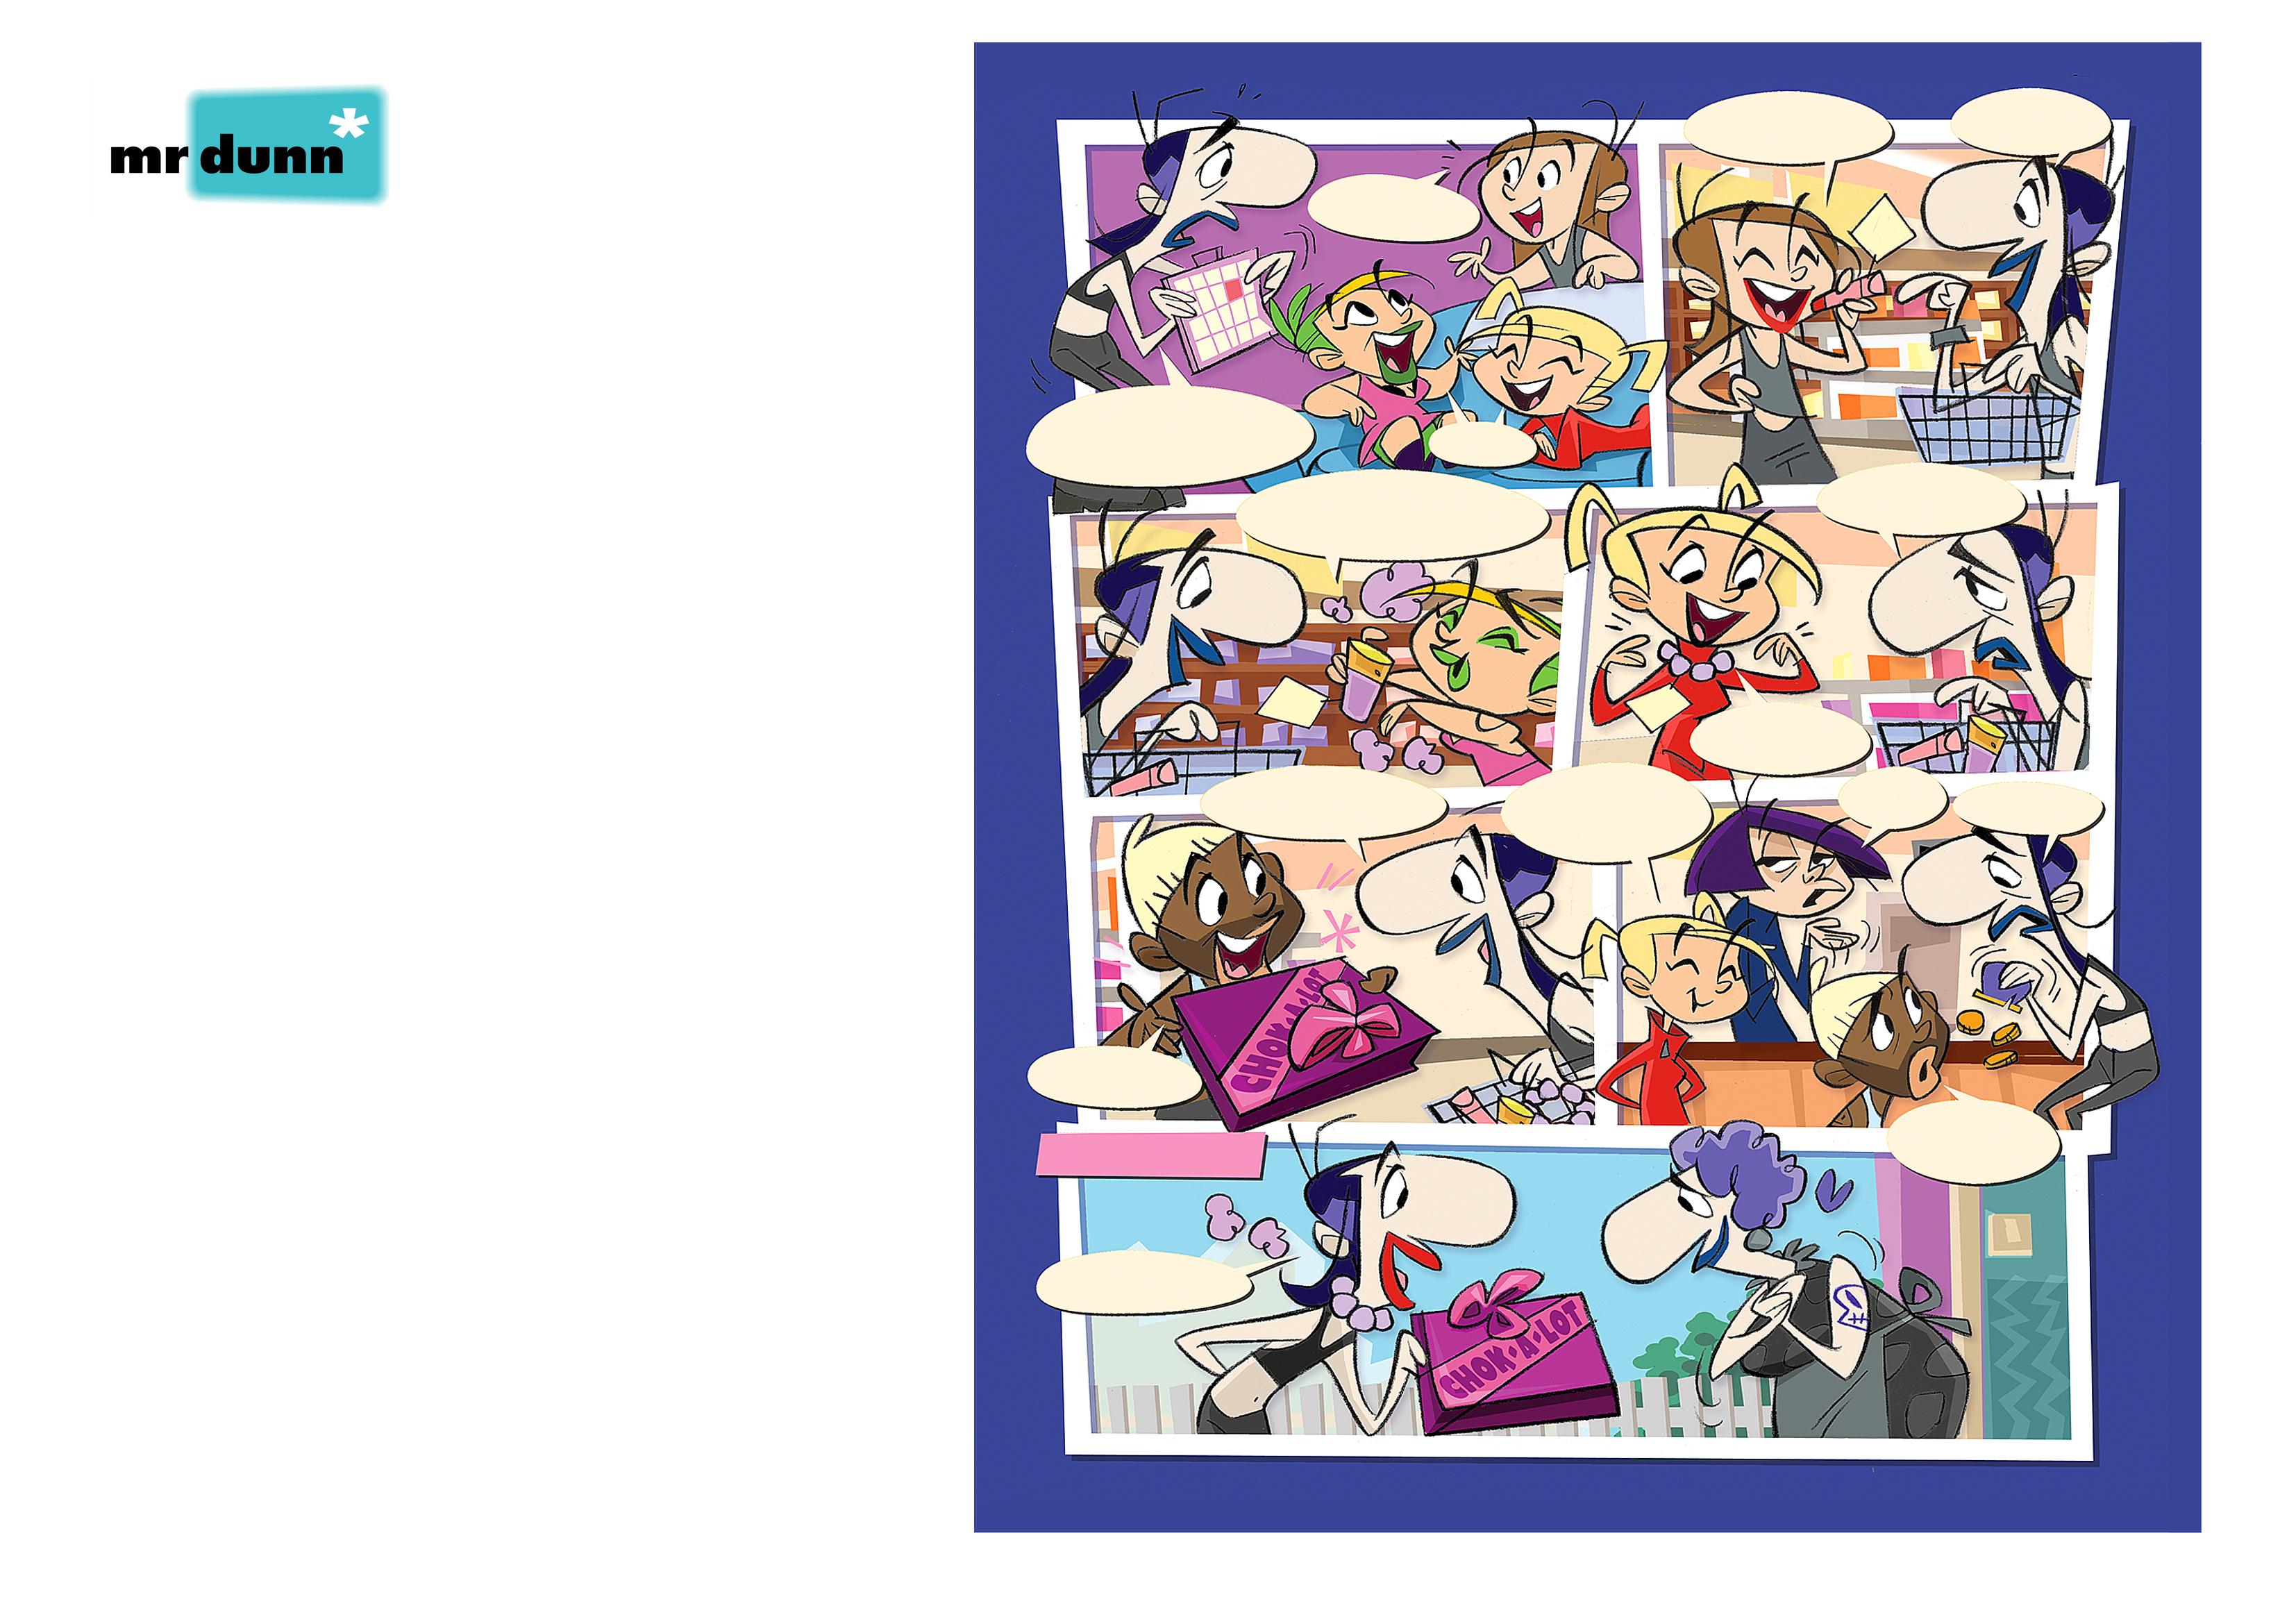 comicstrips